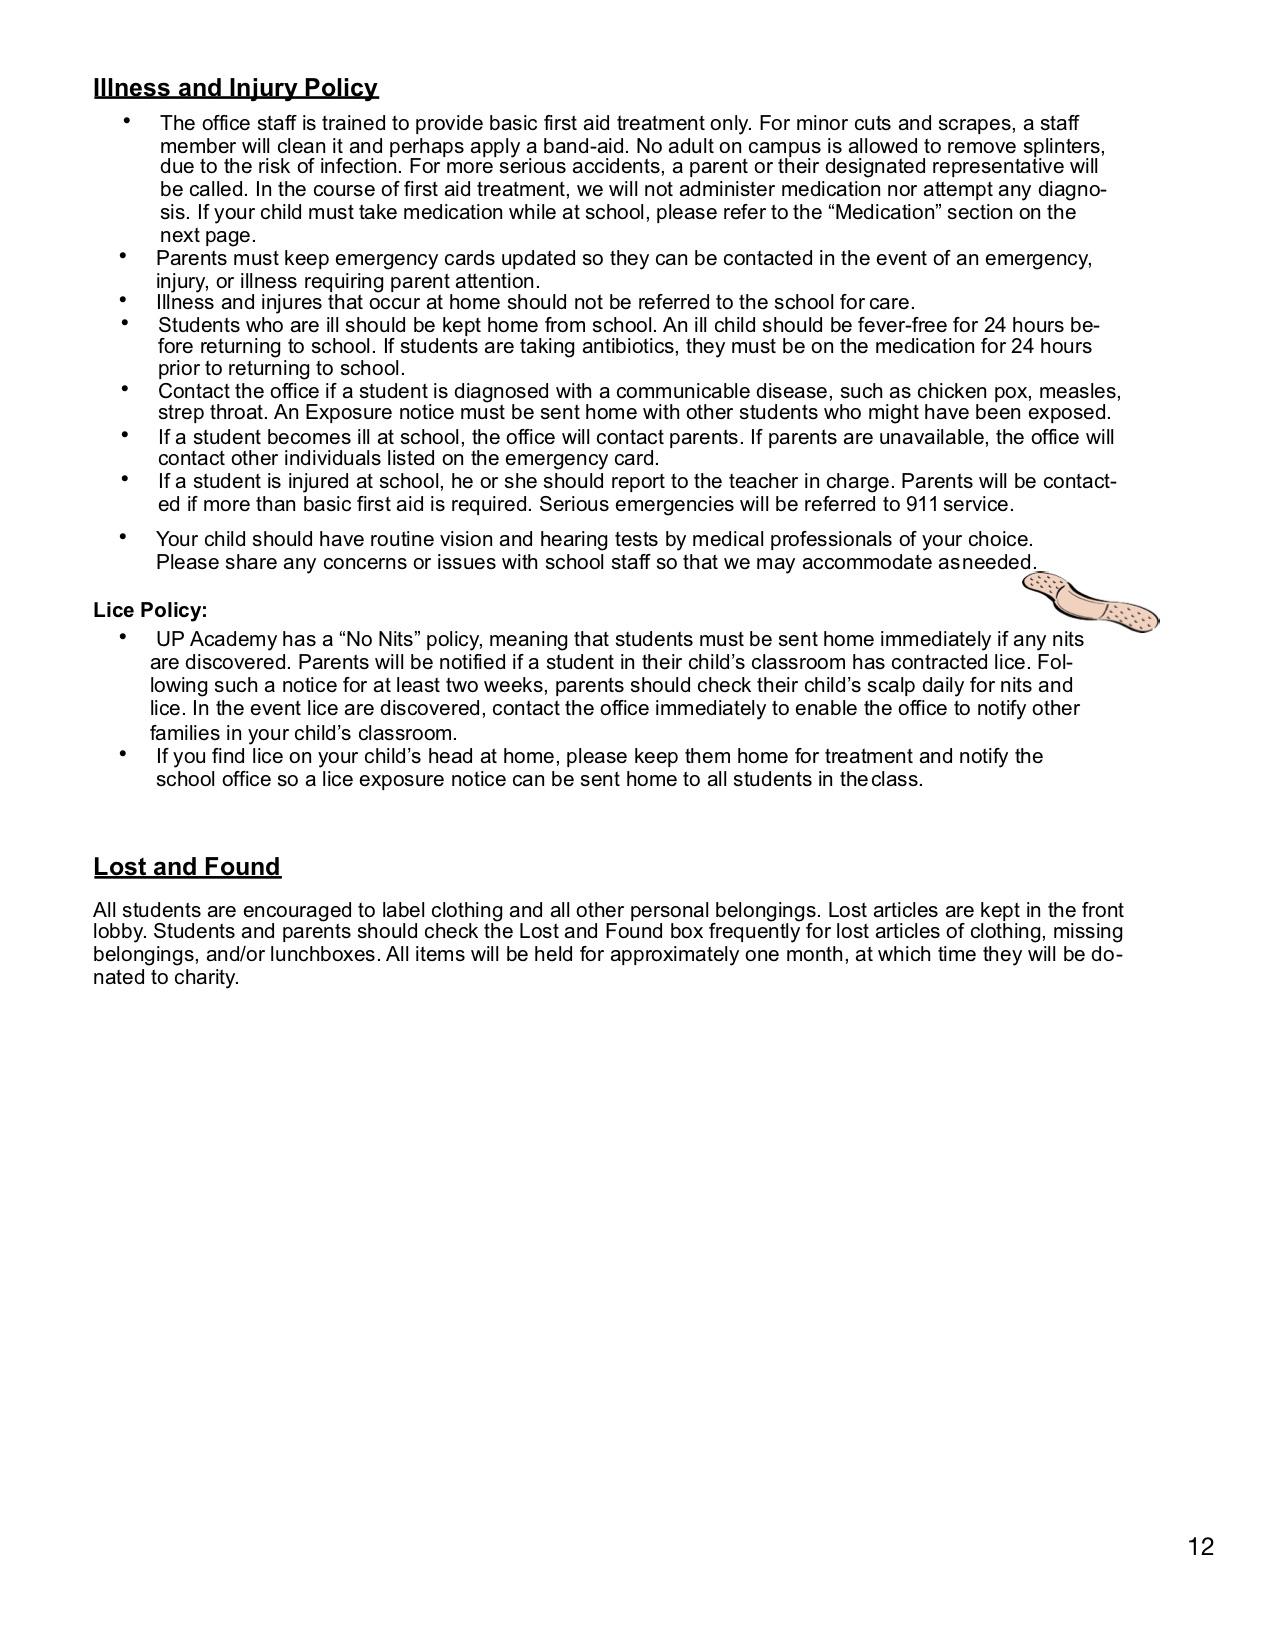 18-19 Parent and Student Handbook V4-11.jpg